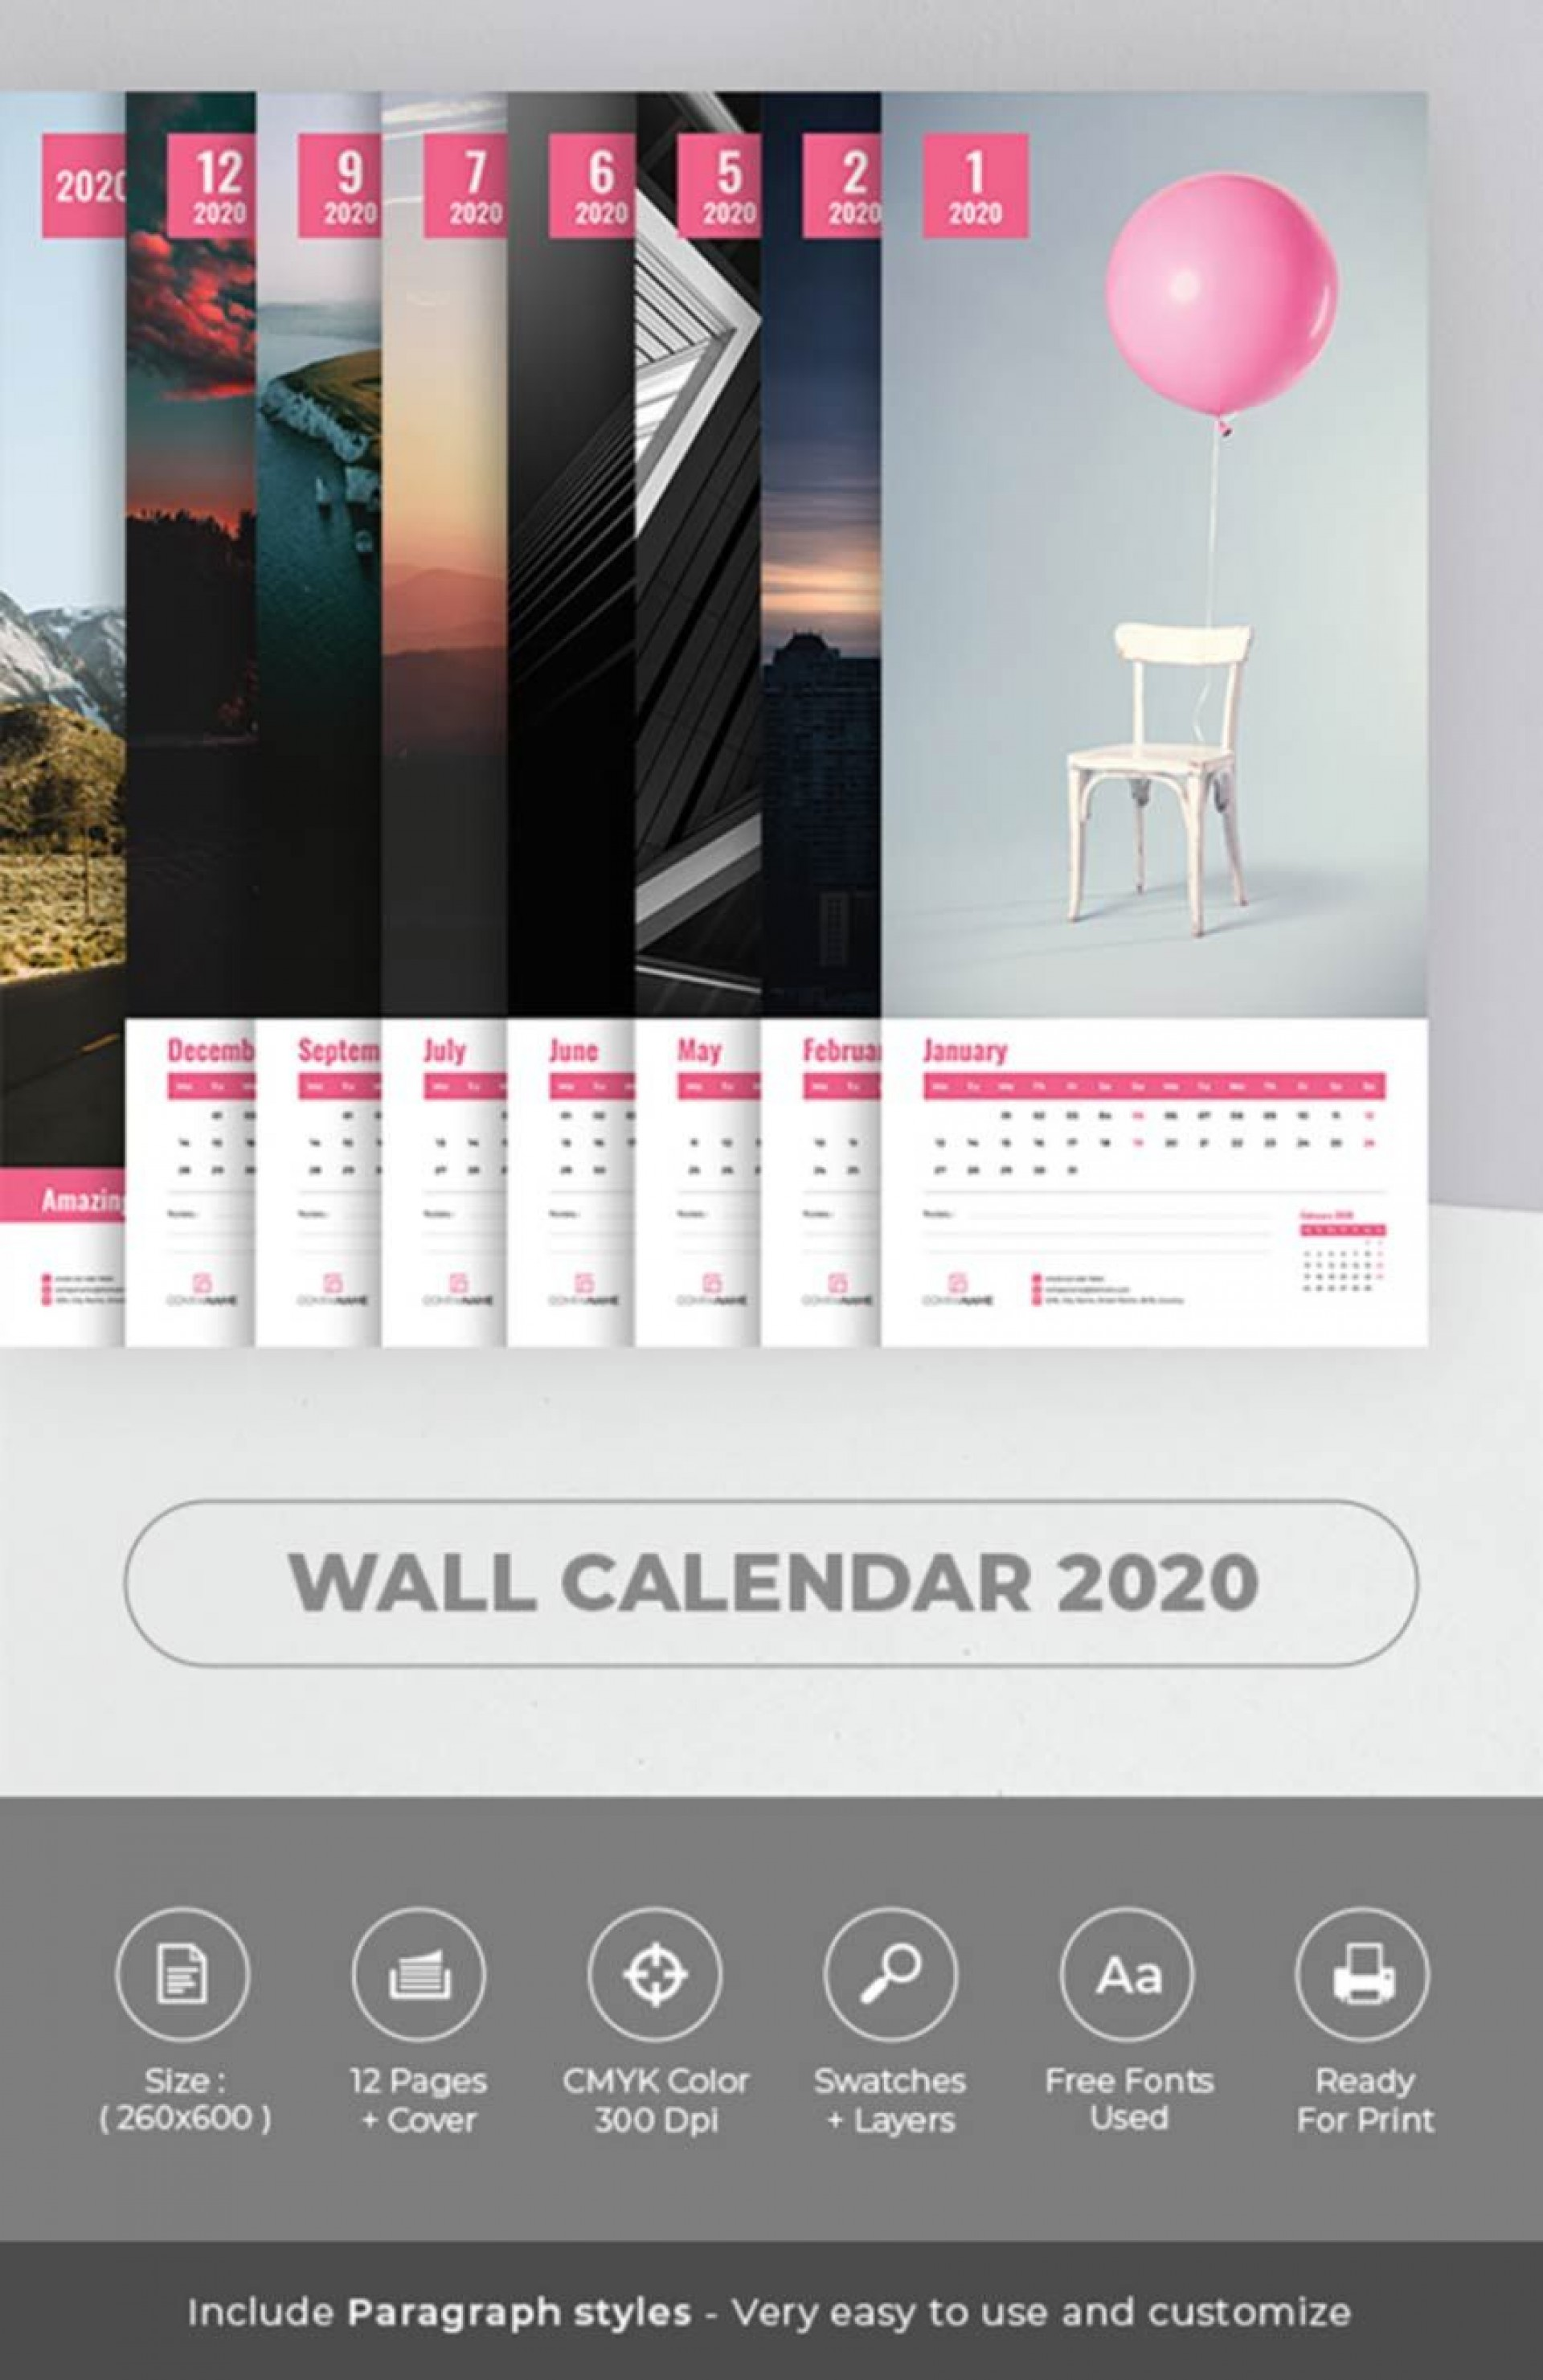 004 Wondrou 2020 Calendar Template Indesign Highest Quality  Adobe Free1920